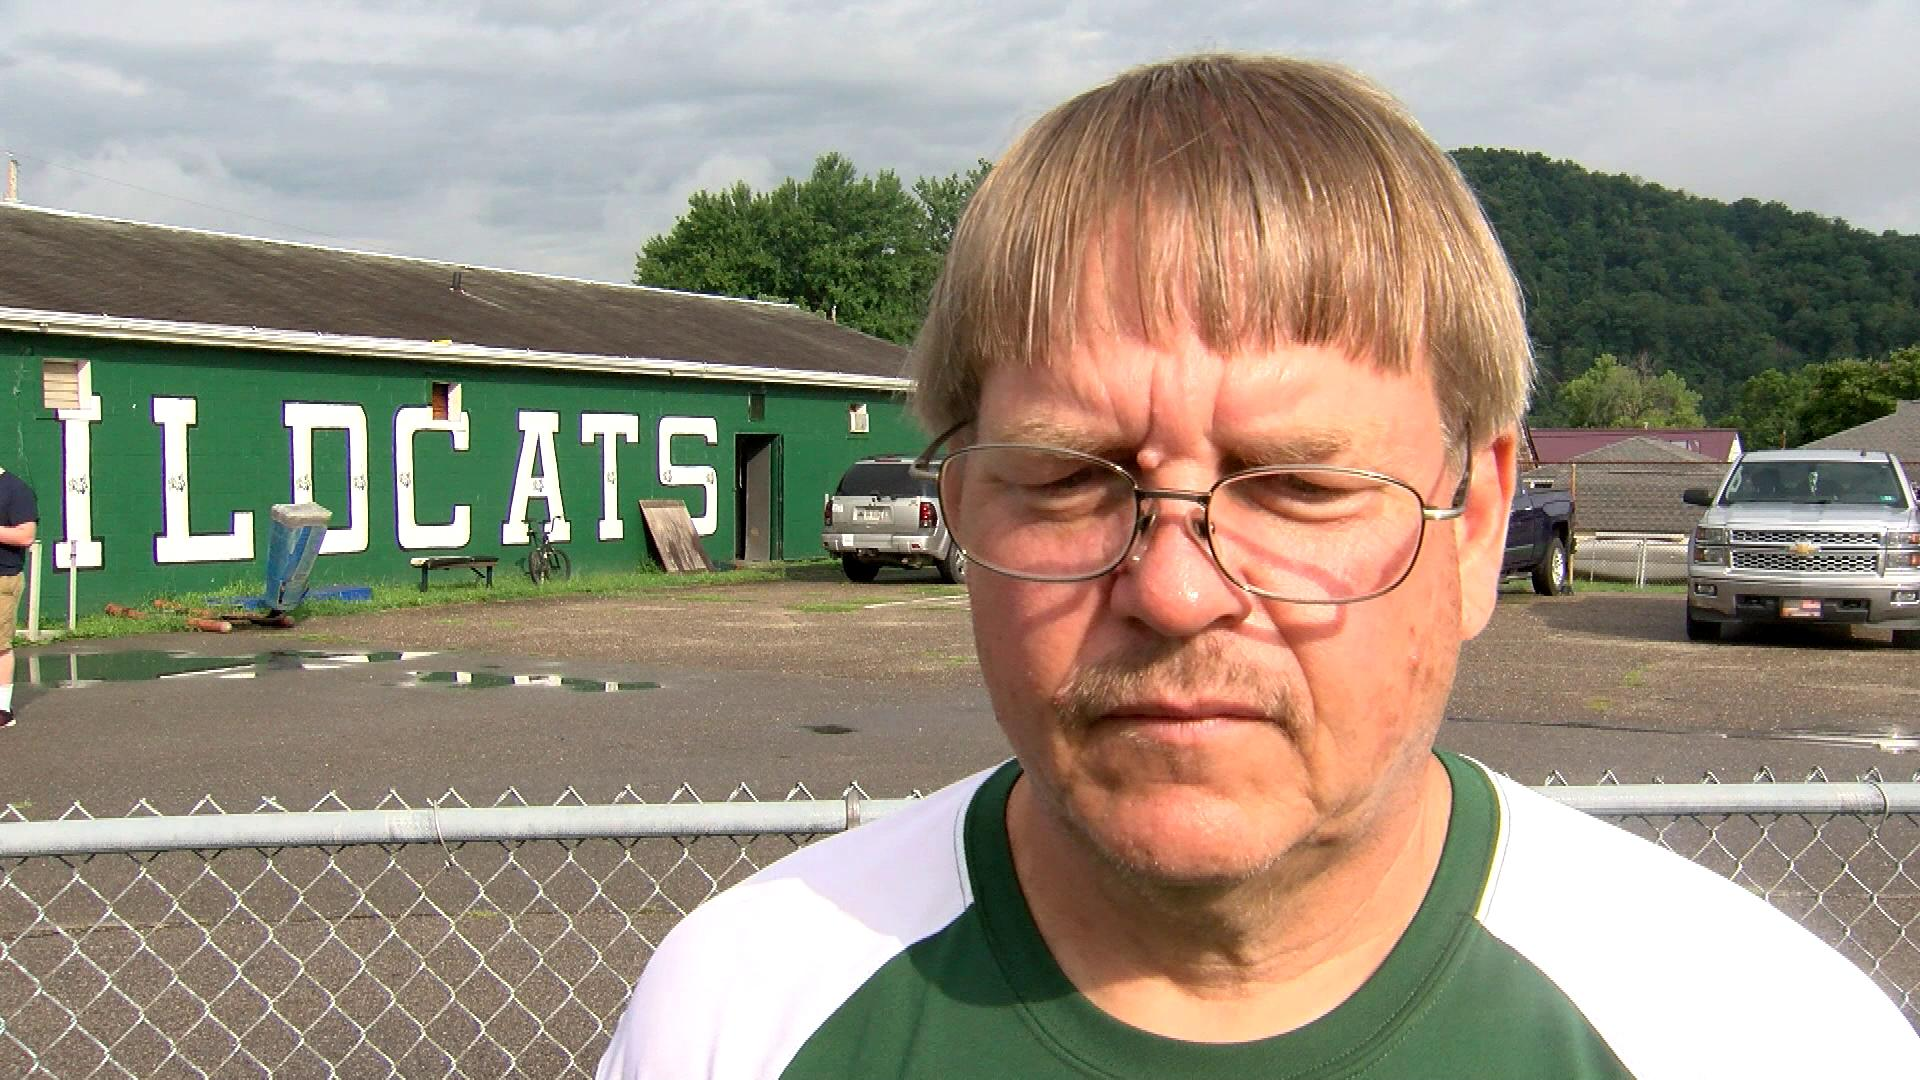 Coach Brent Croasmun